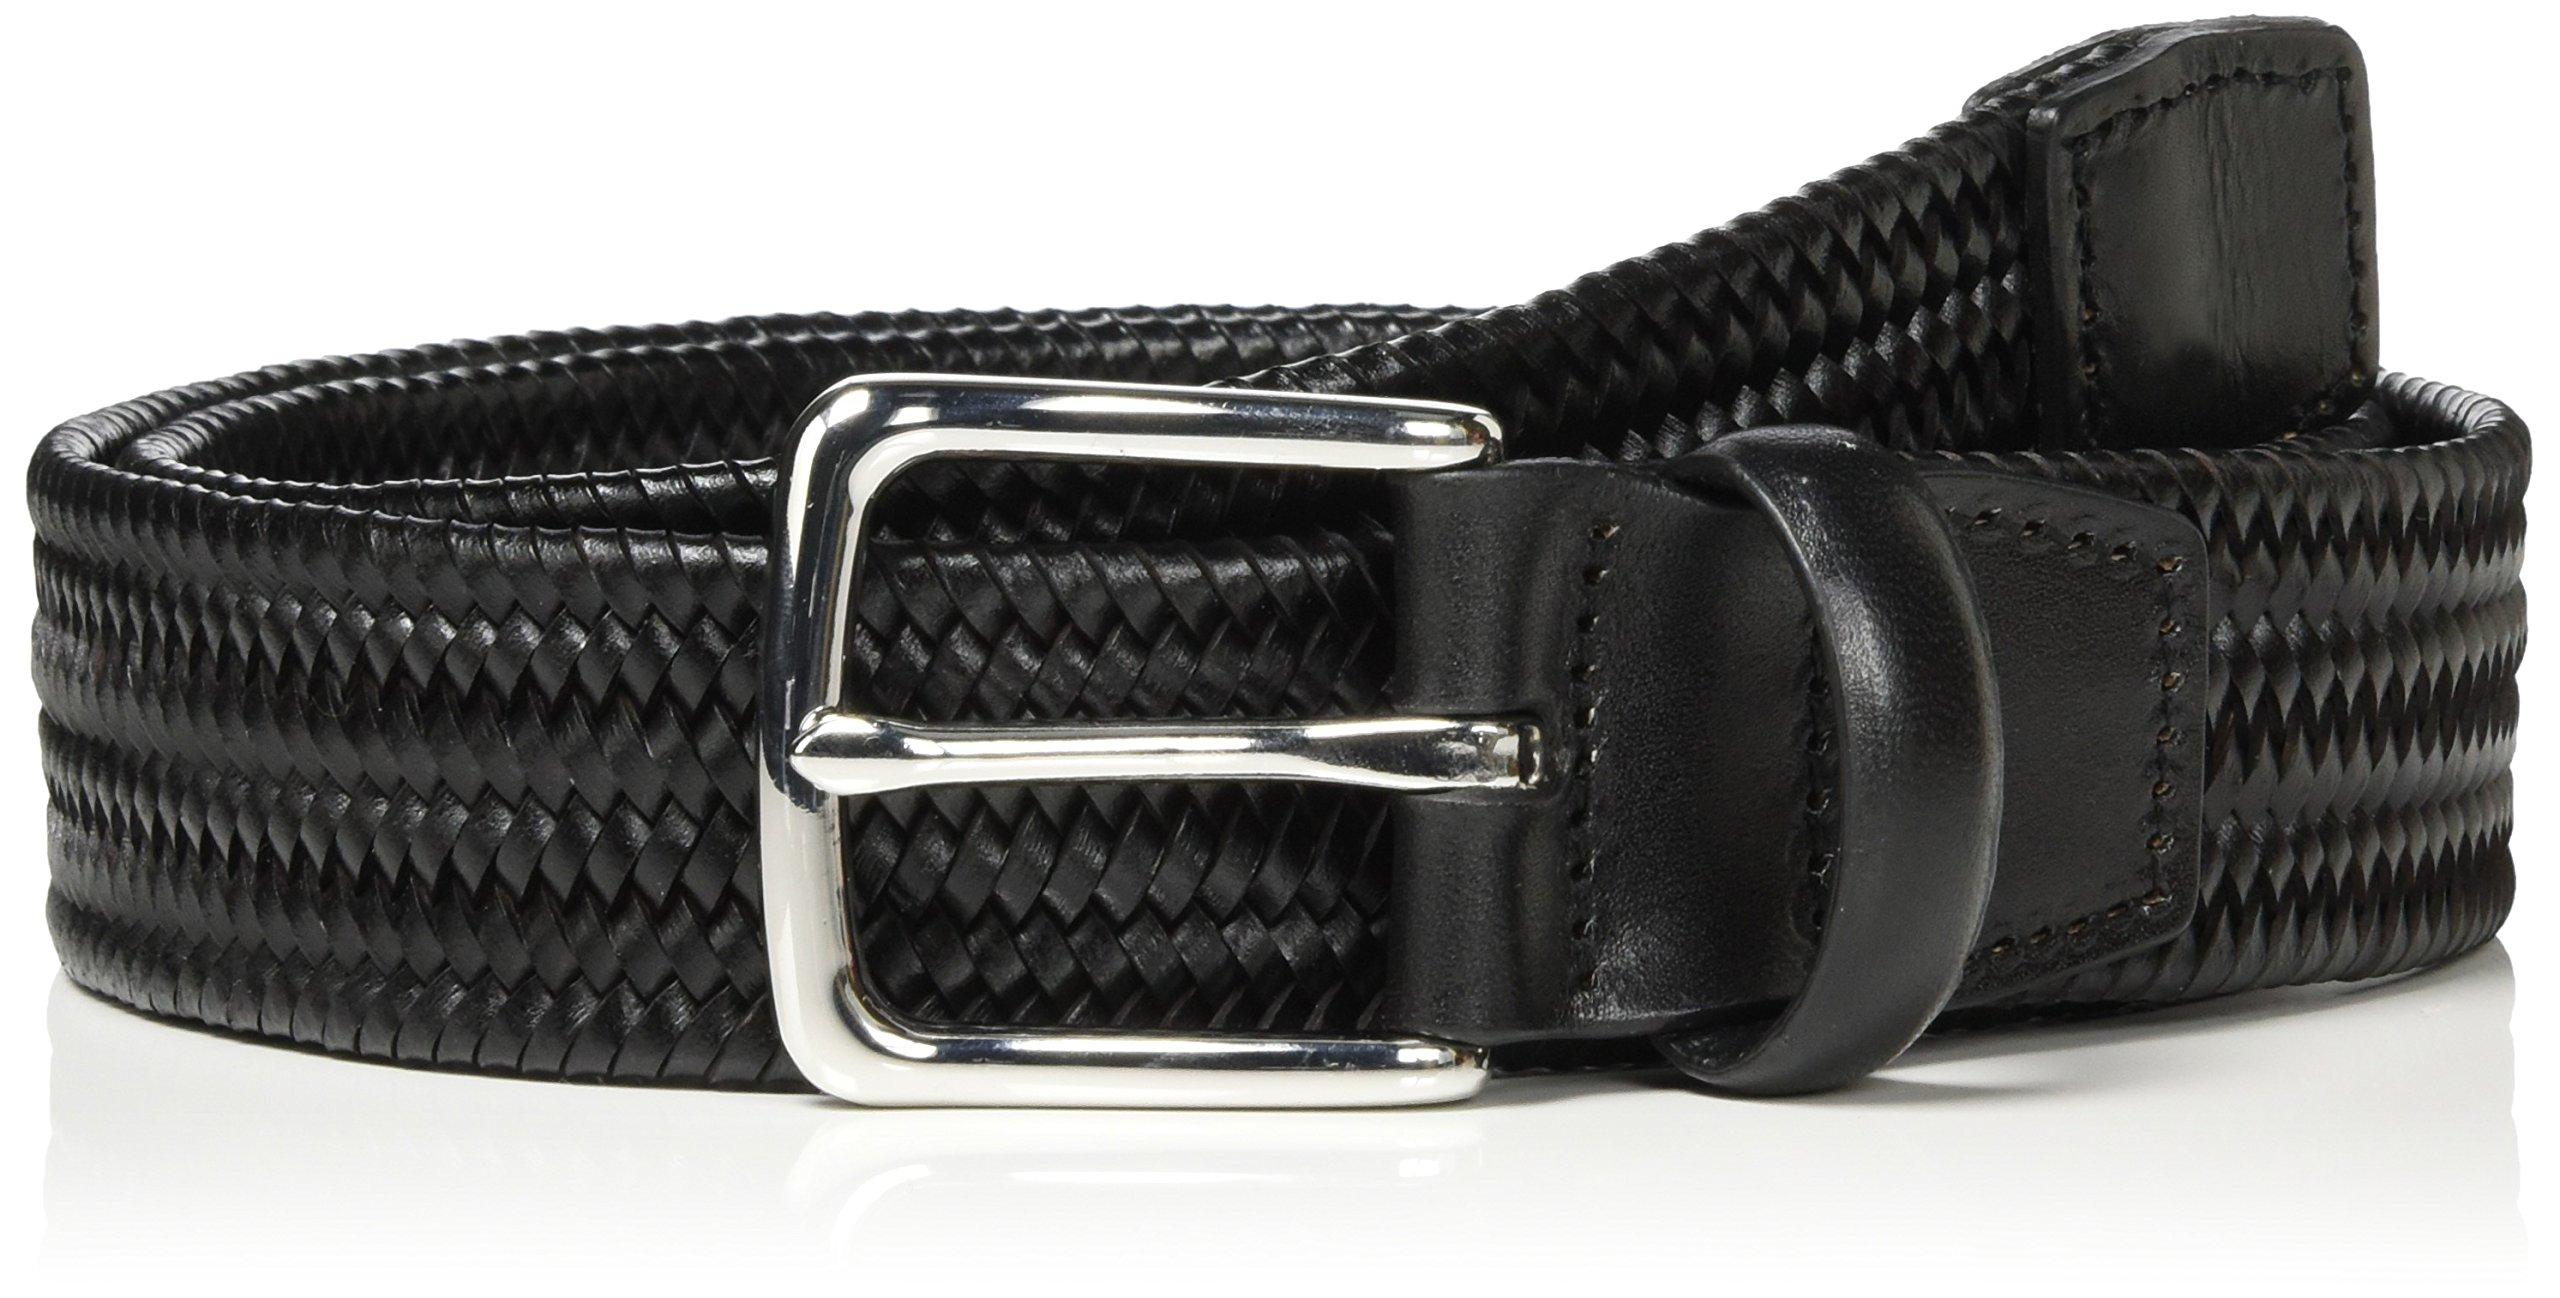 Dockers Iconic Clean Belt Cinturón para Hombre